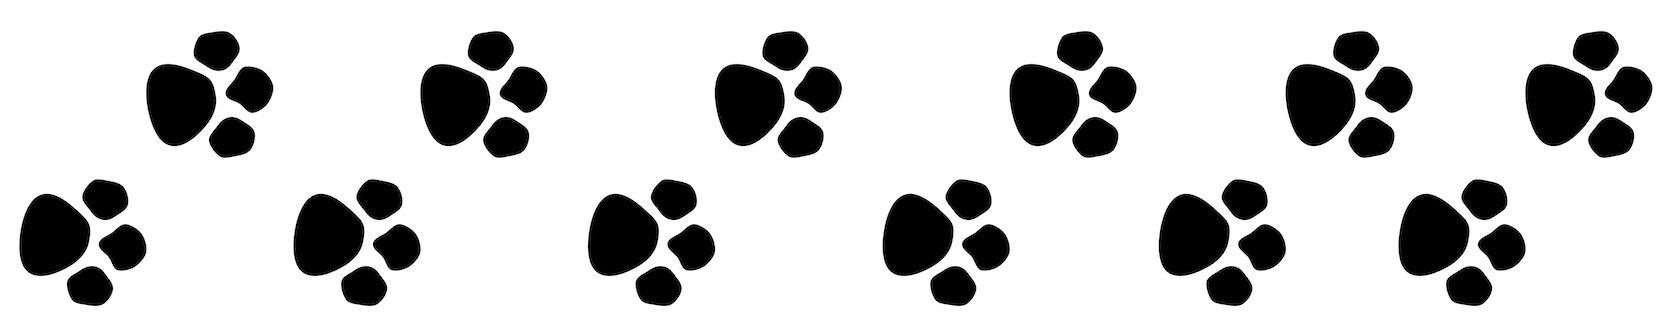 Animal Paw Print | Free download best Animal Paw Print on